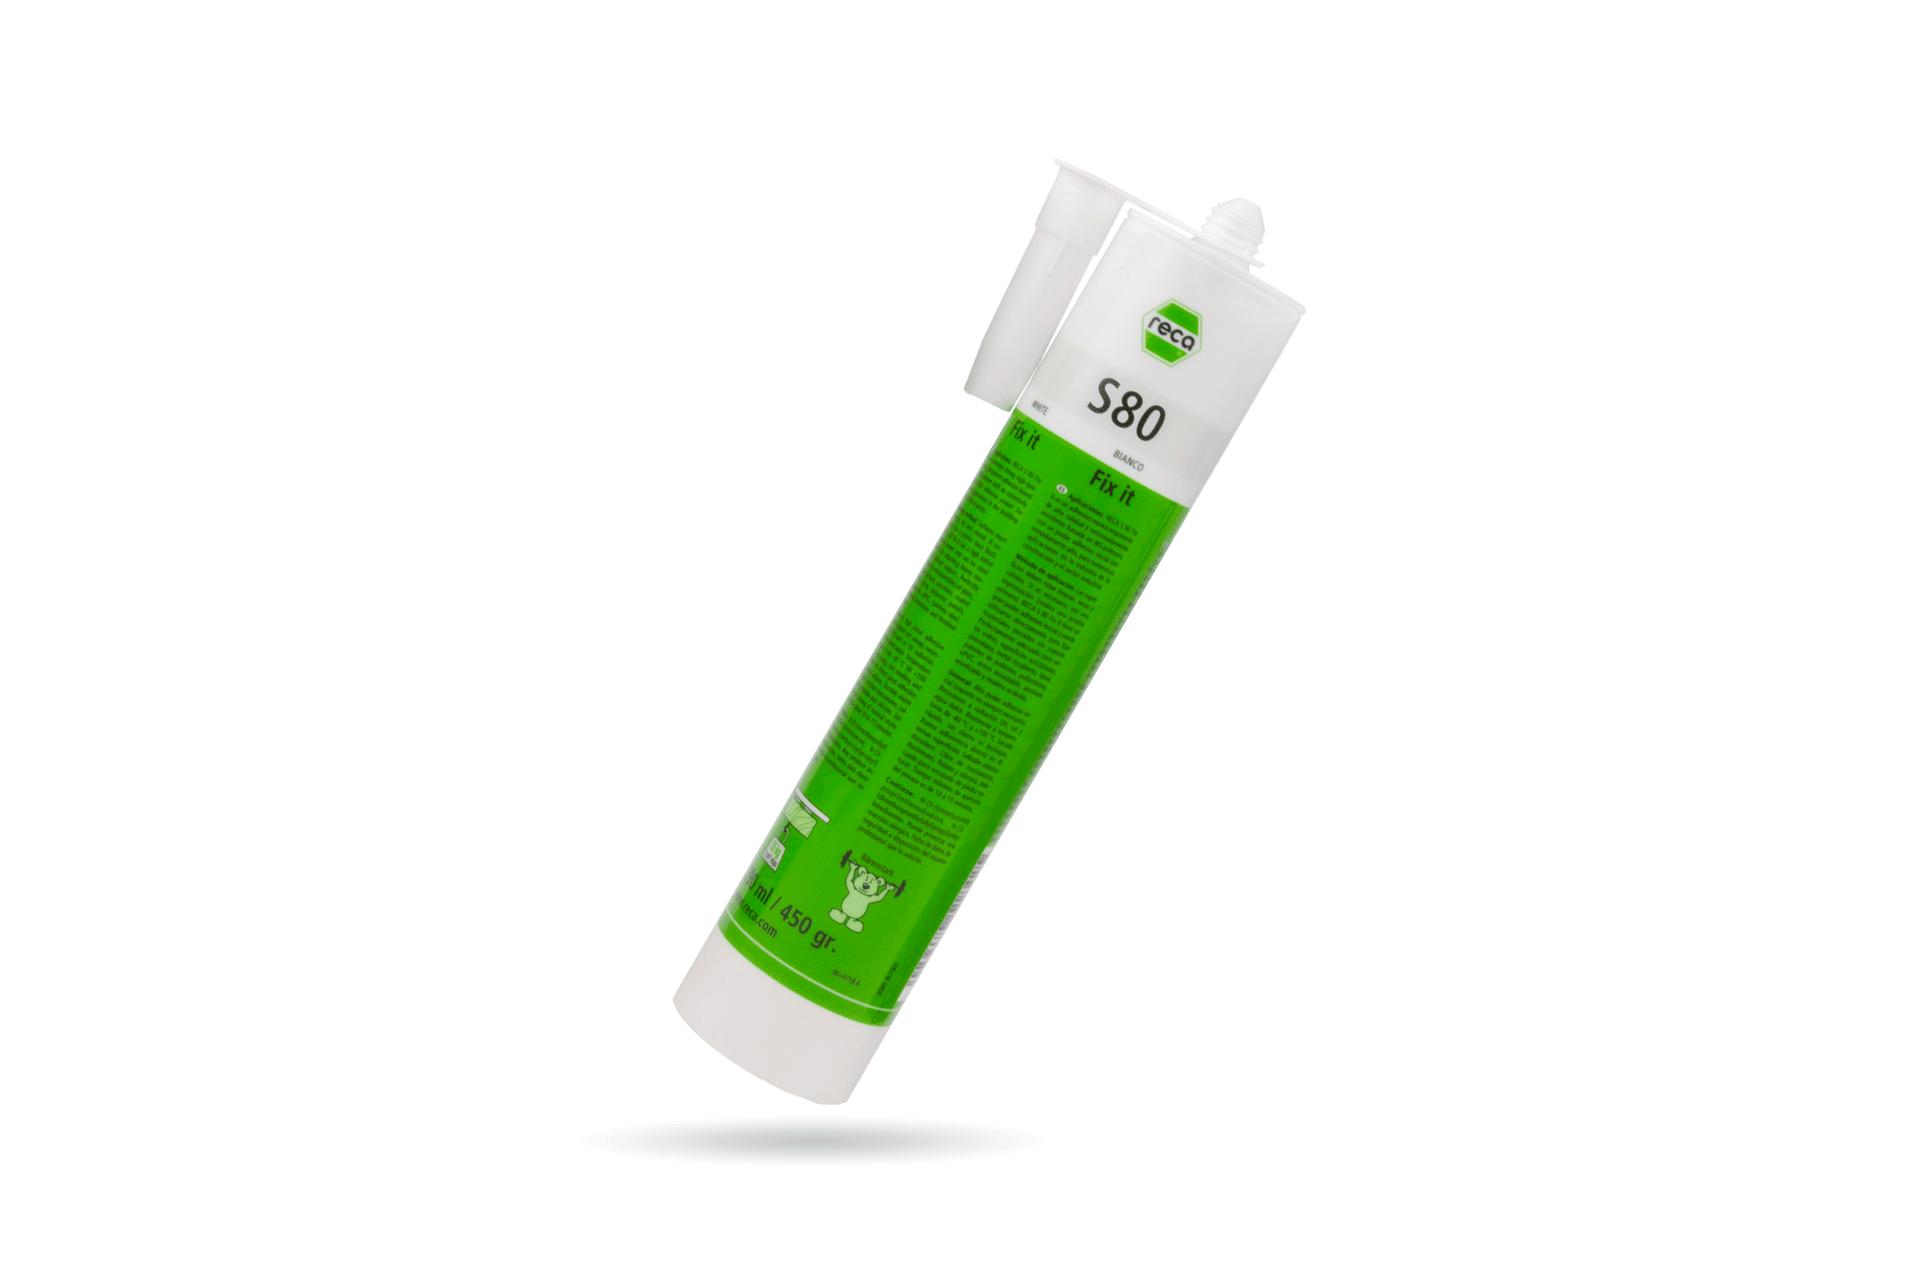 Reca Kleber S 80 fix it (290 ml) mit hoher Anfangshaftung